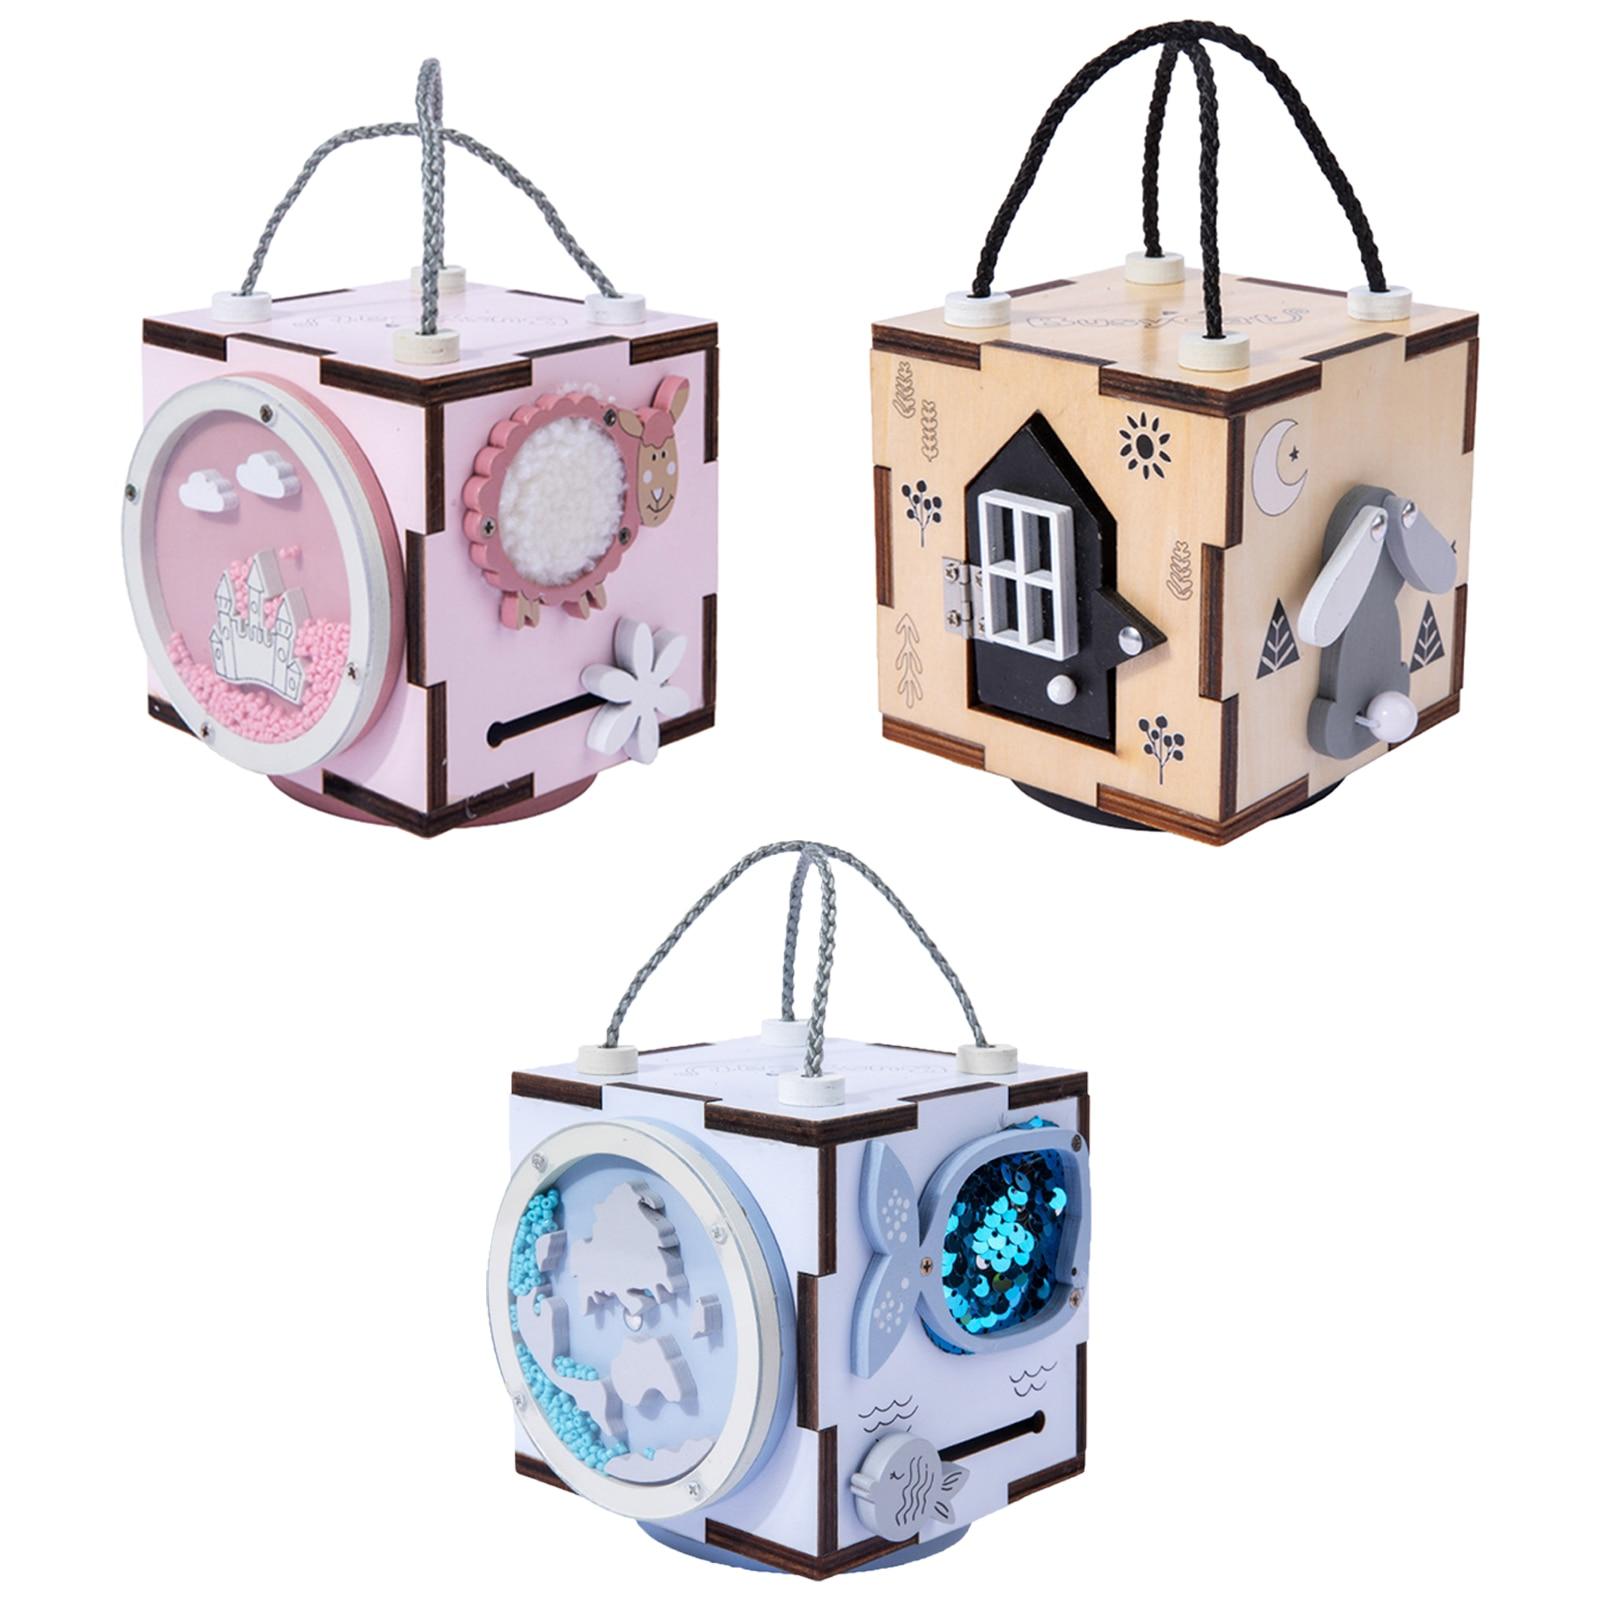 Montessori Busy Board Box Life Skills Training Fine Motor Skills Toy for Kids Boys Girls